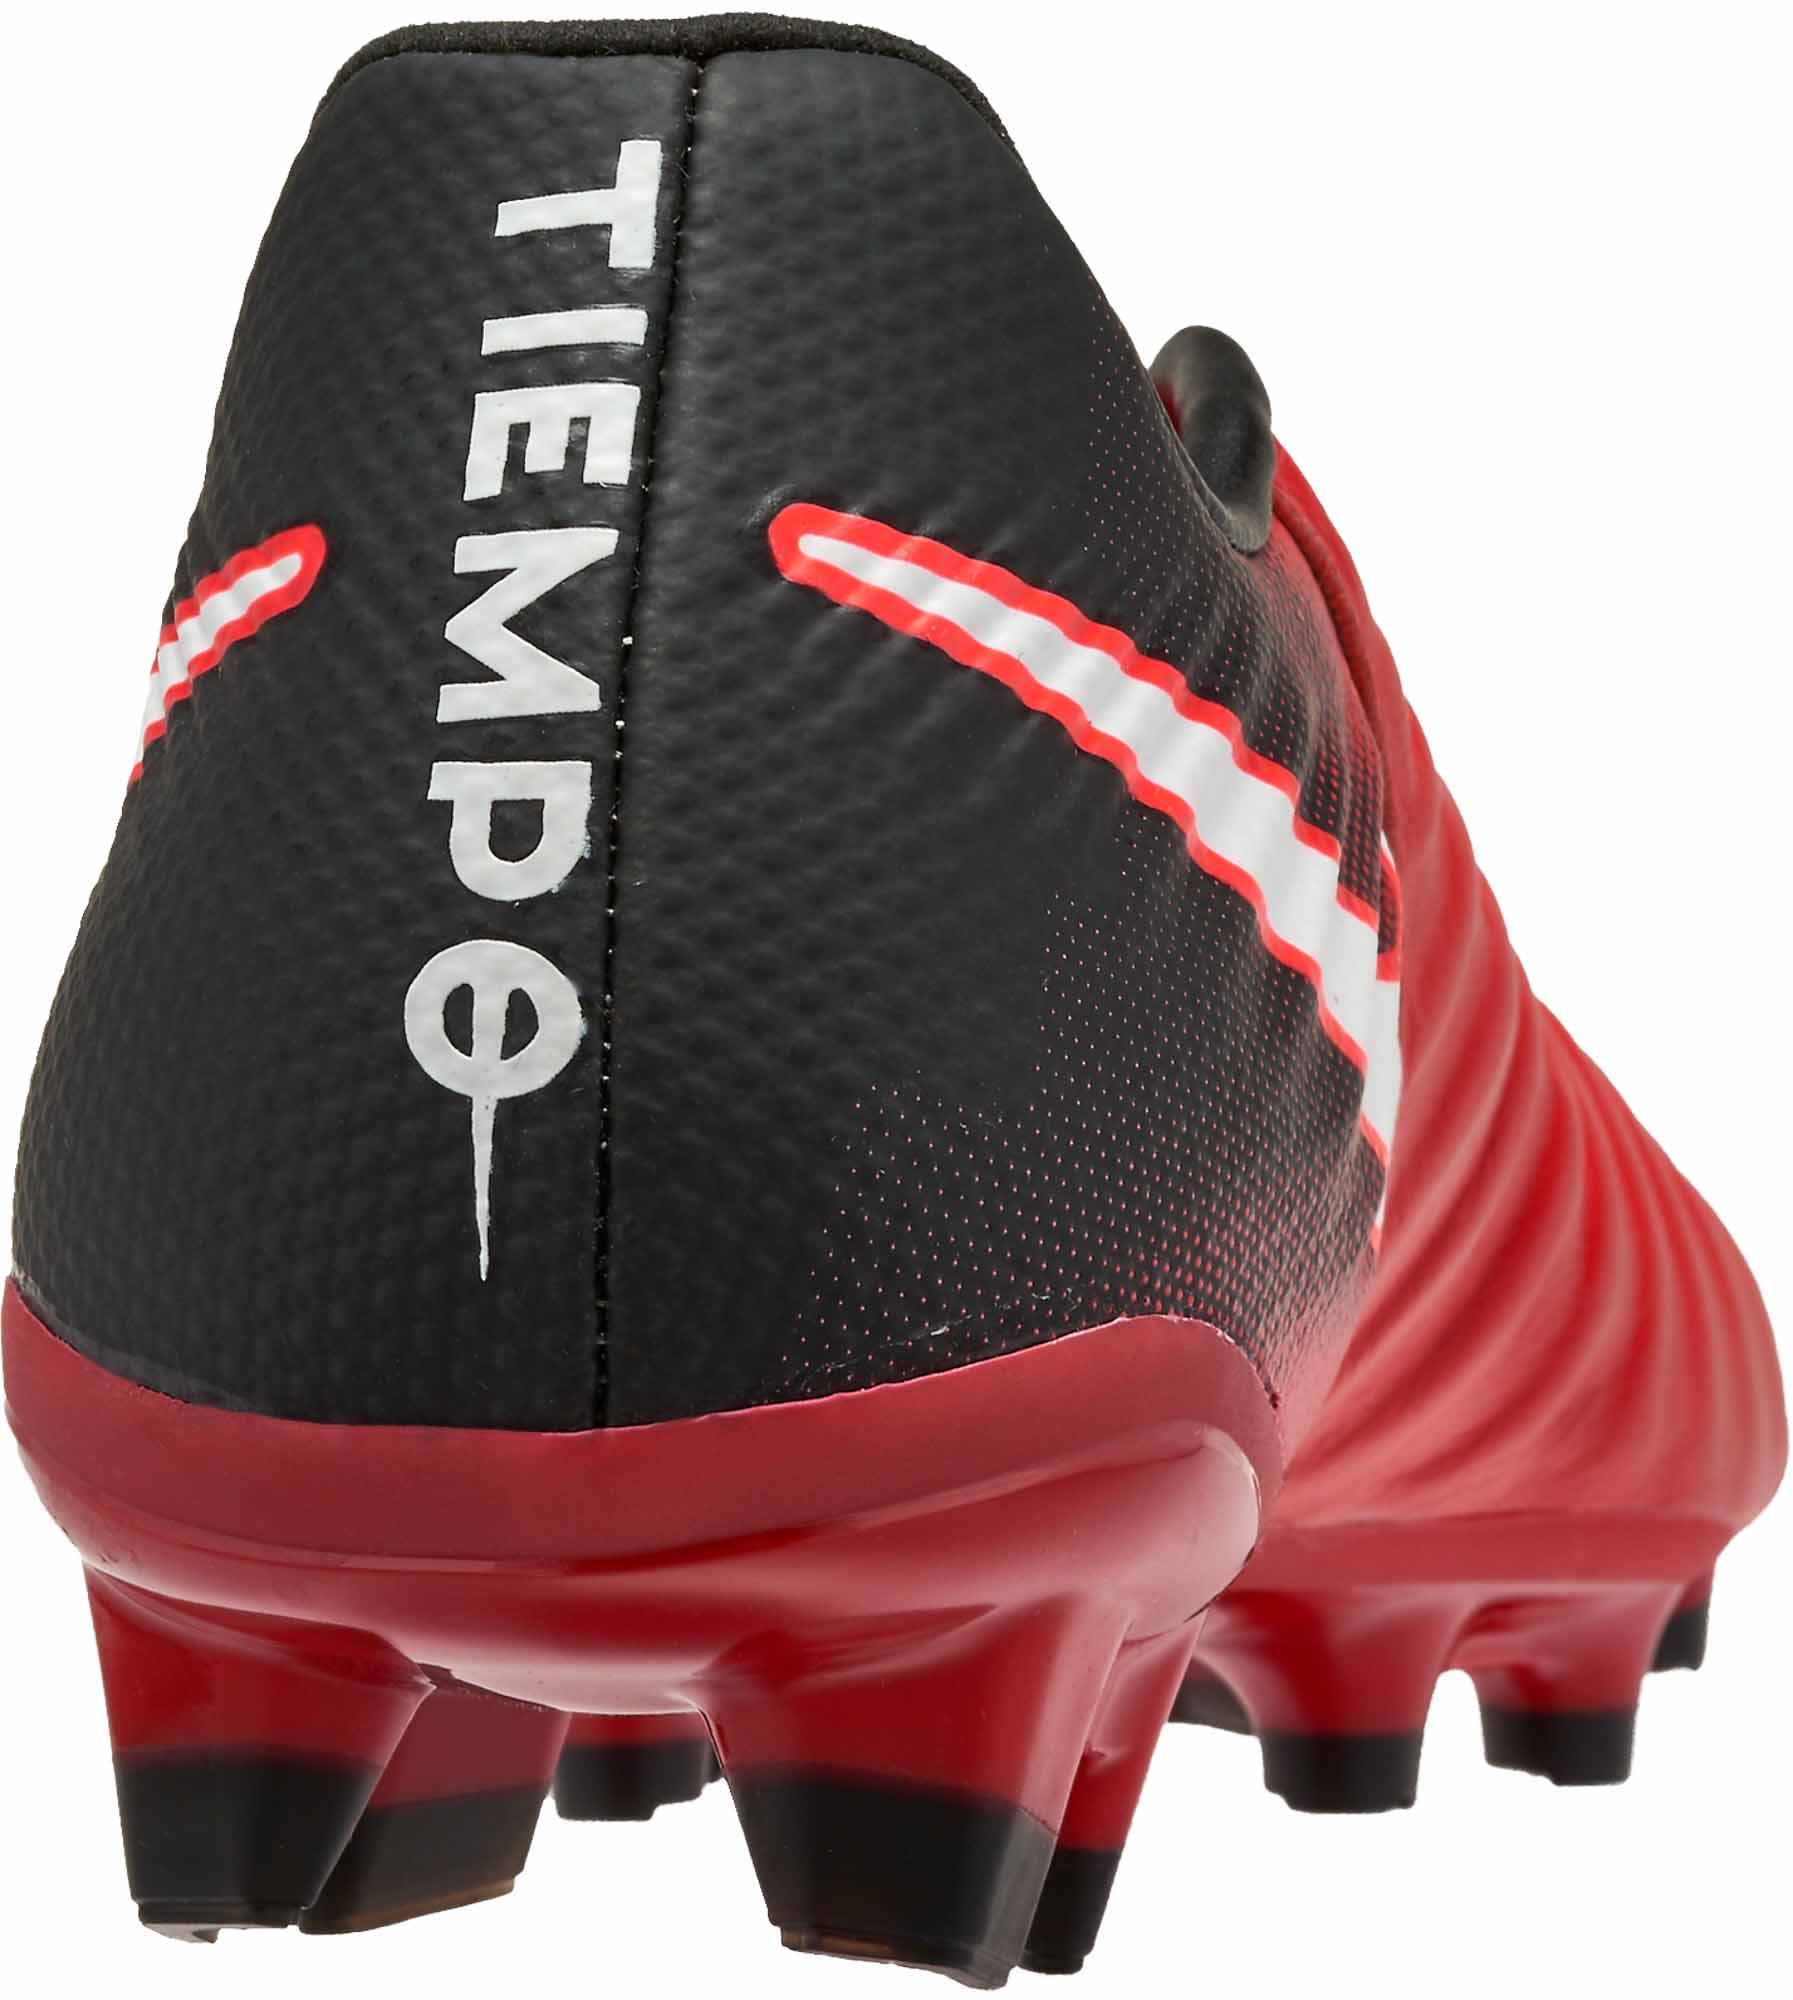 63e368d04 Nike Kids Tiempo Legend VII FG - University Red   White - Soccer Master